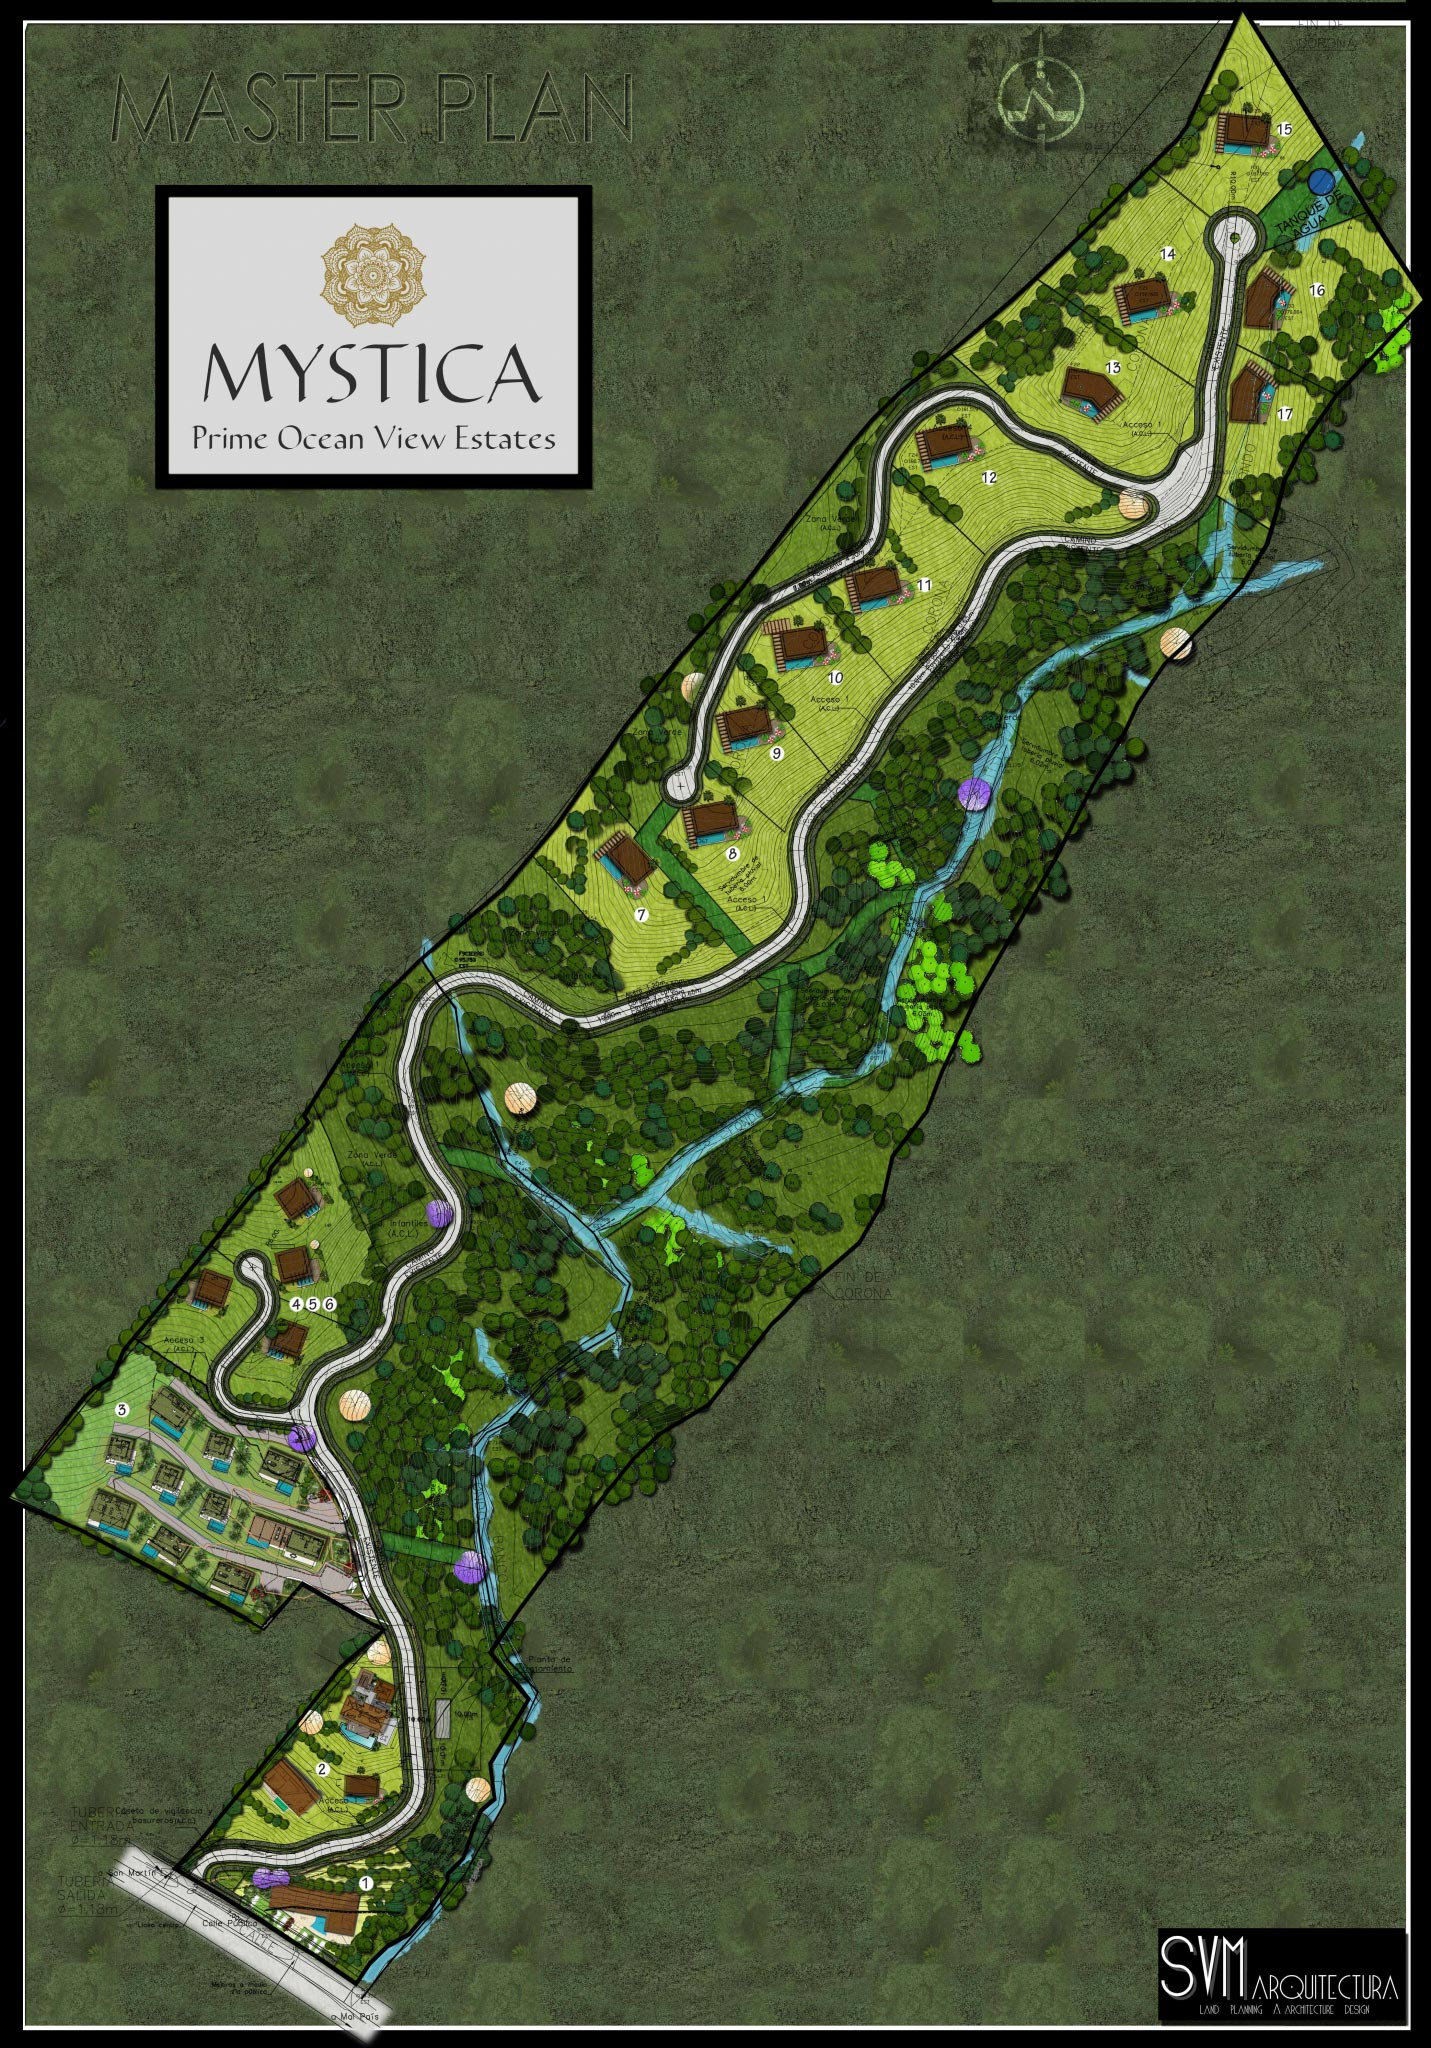 mystica-master-plan